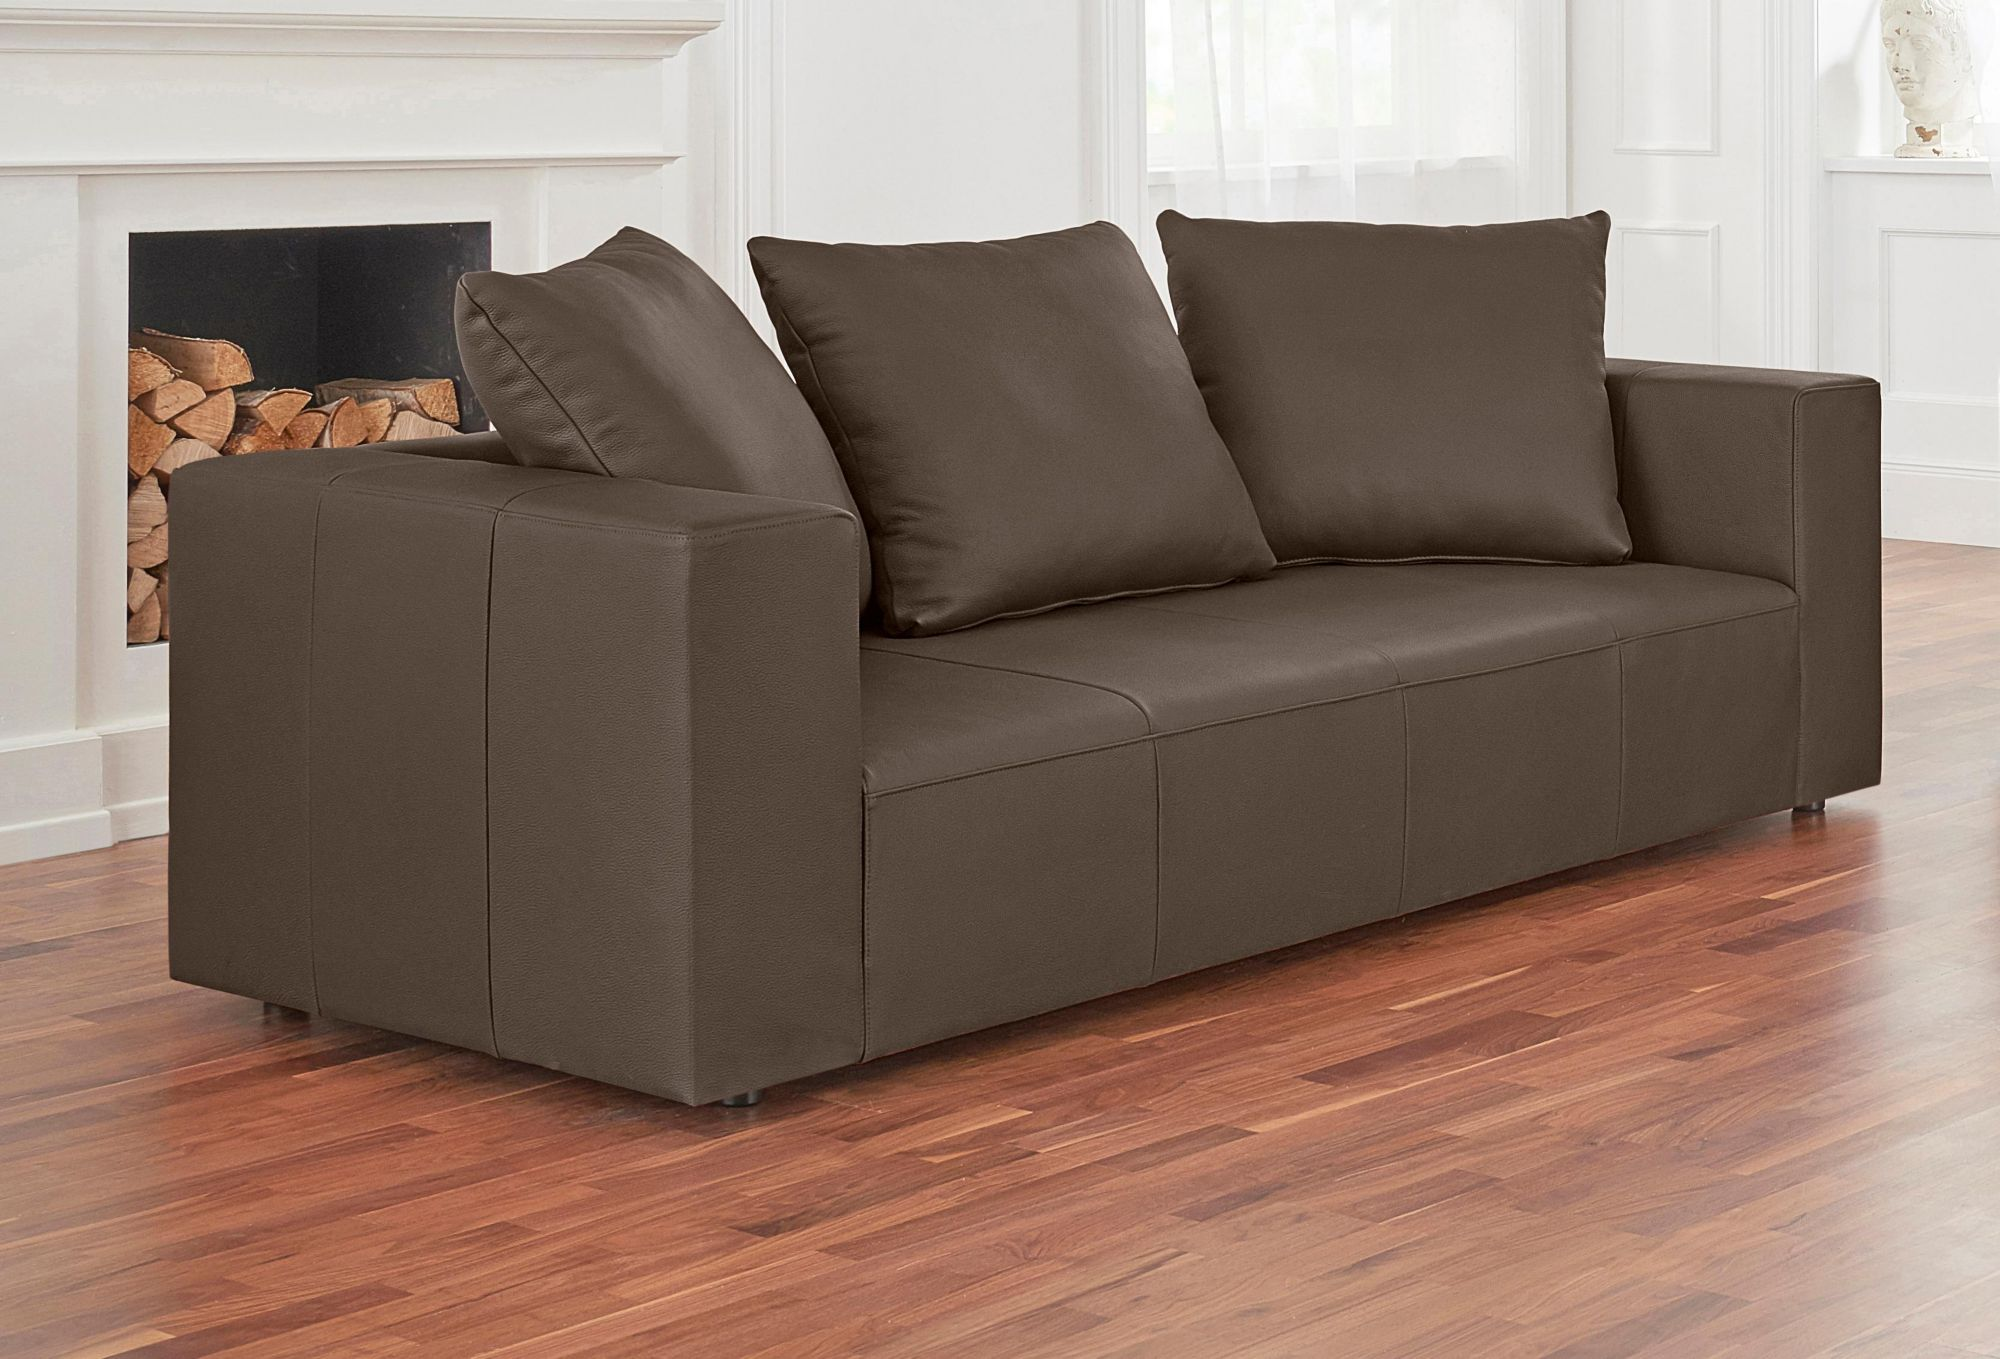 ALTE GERBEREI Alte Gerberei 2-Sitzer Sofa »Konstantin«, inklusive Rückenkissen